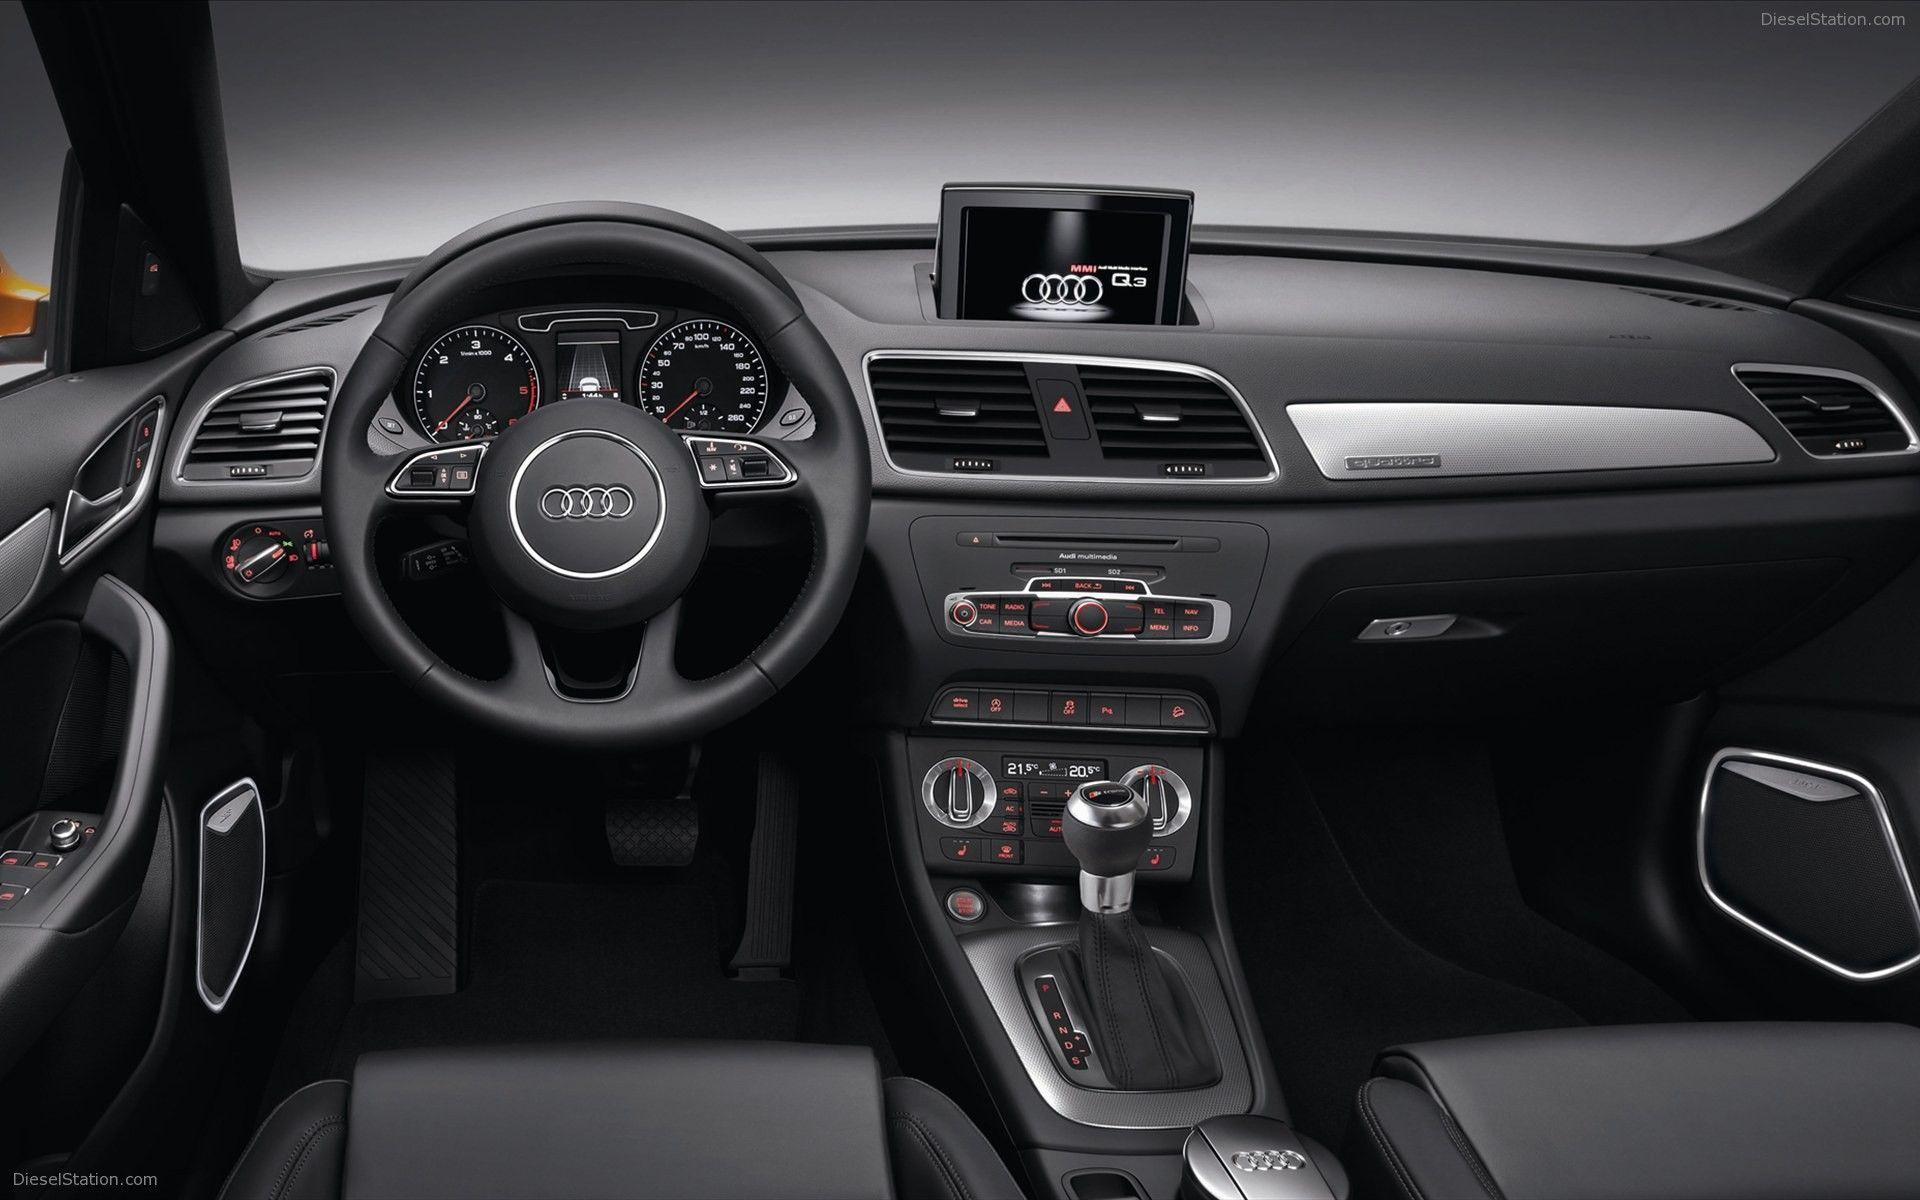 Audi Q3 Audi Q3 Audi Q5 Audi Q5 Price